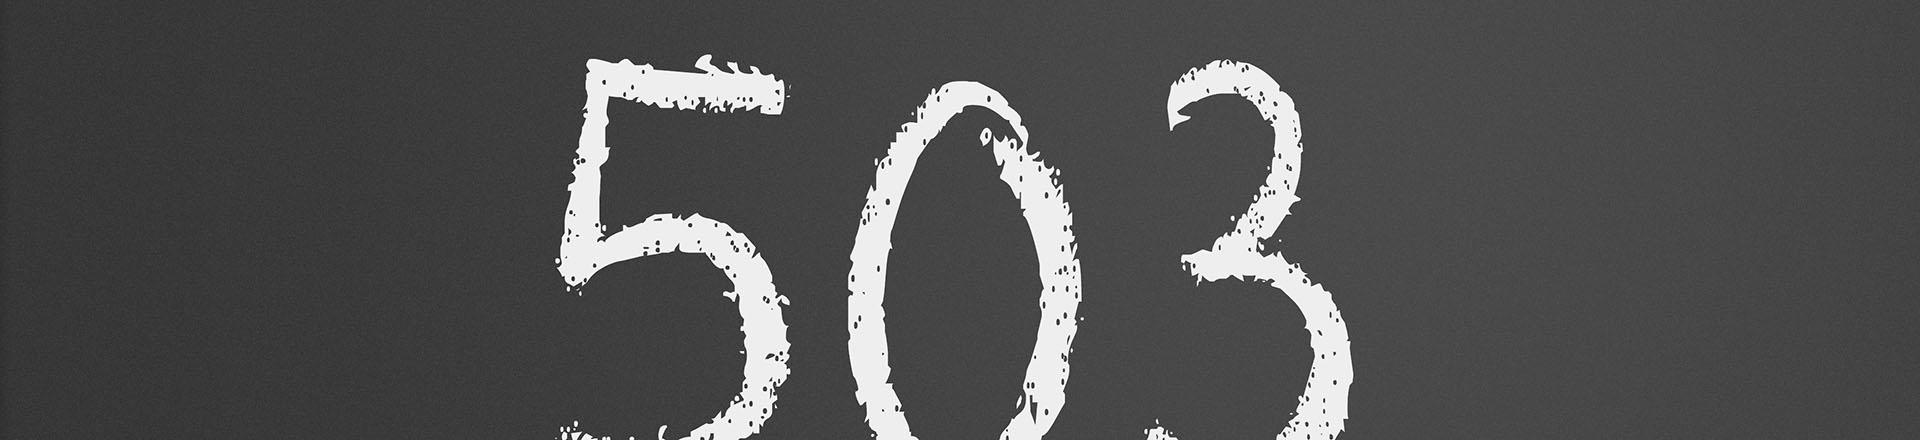 HTTP Error 503 (Service Unavailable): how to fix website